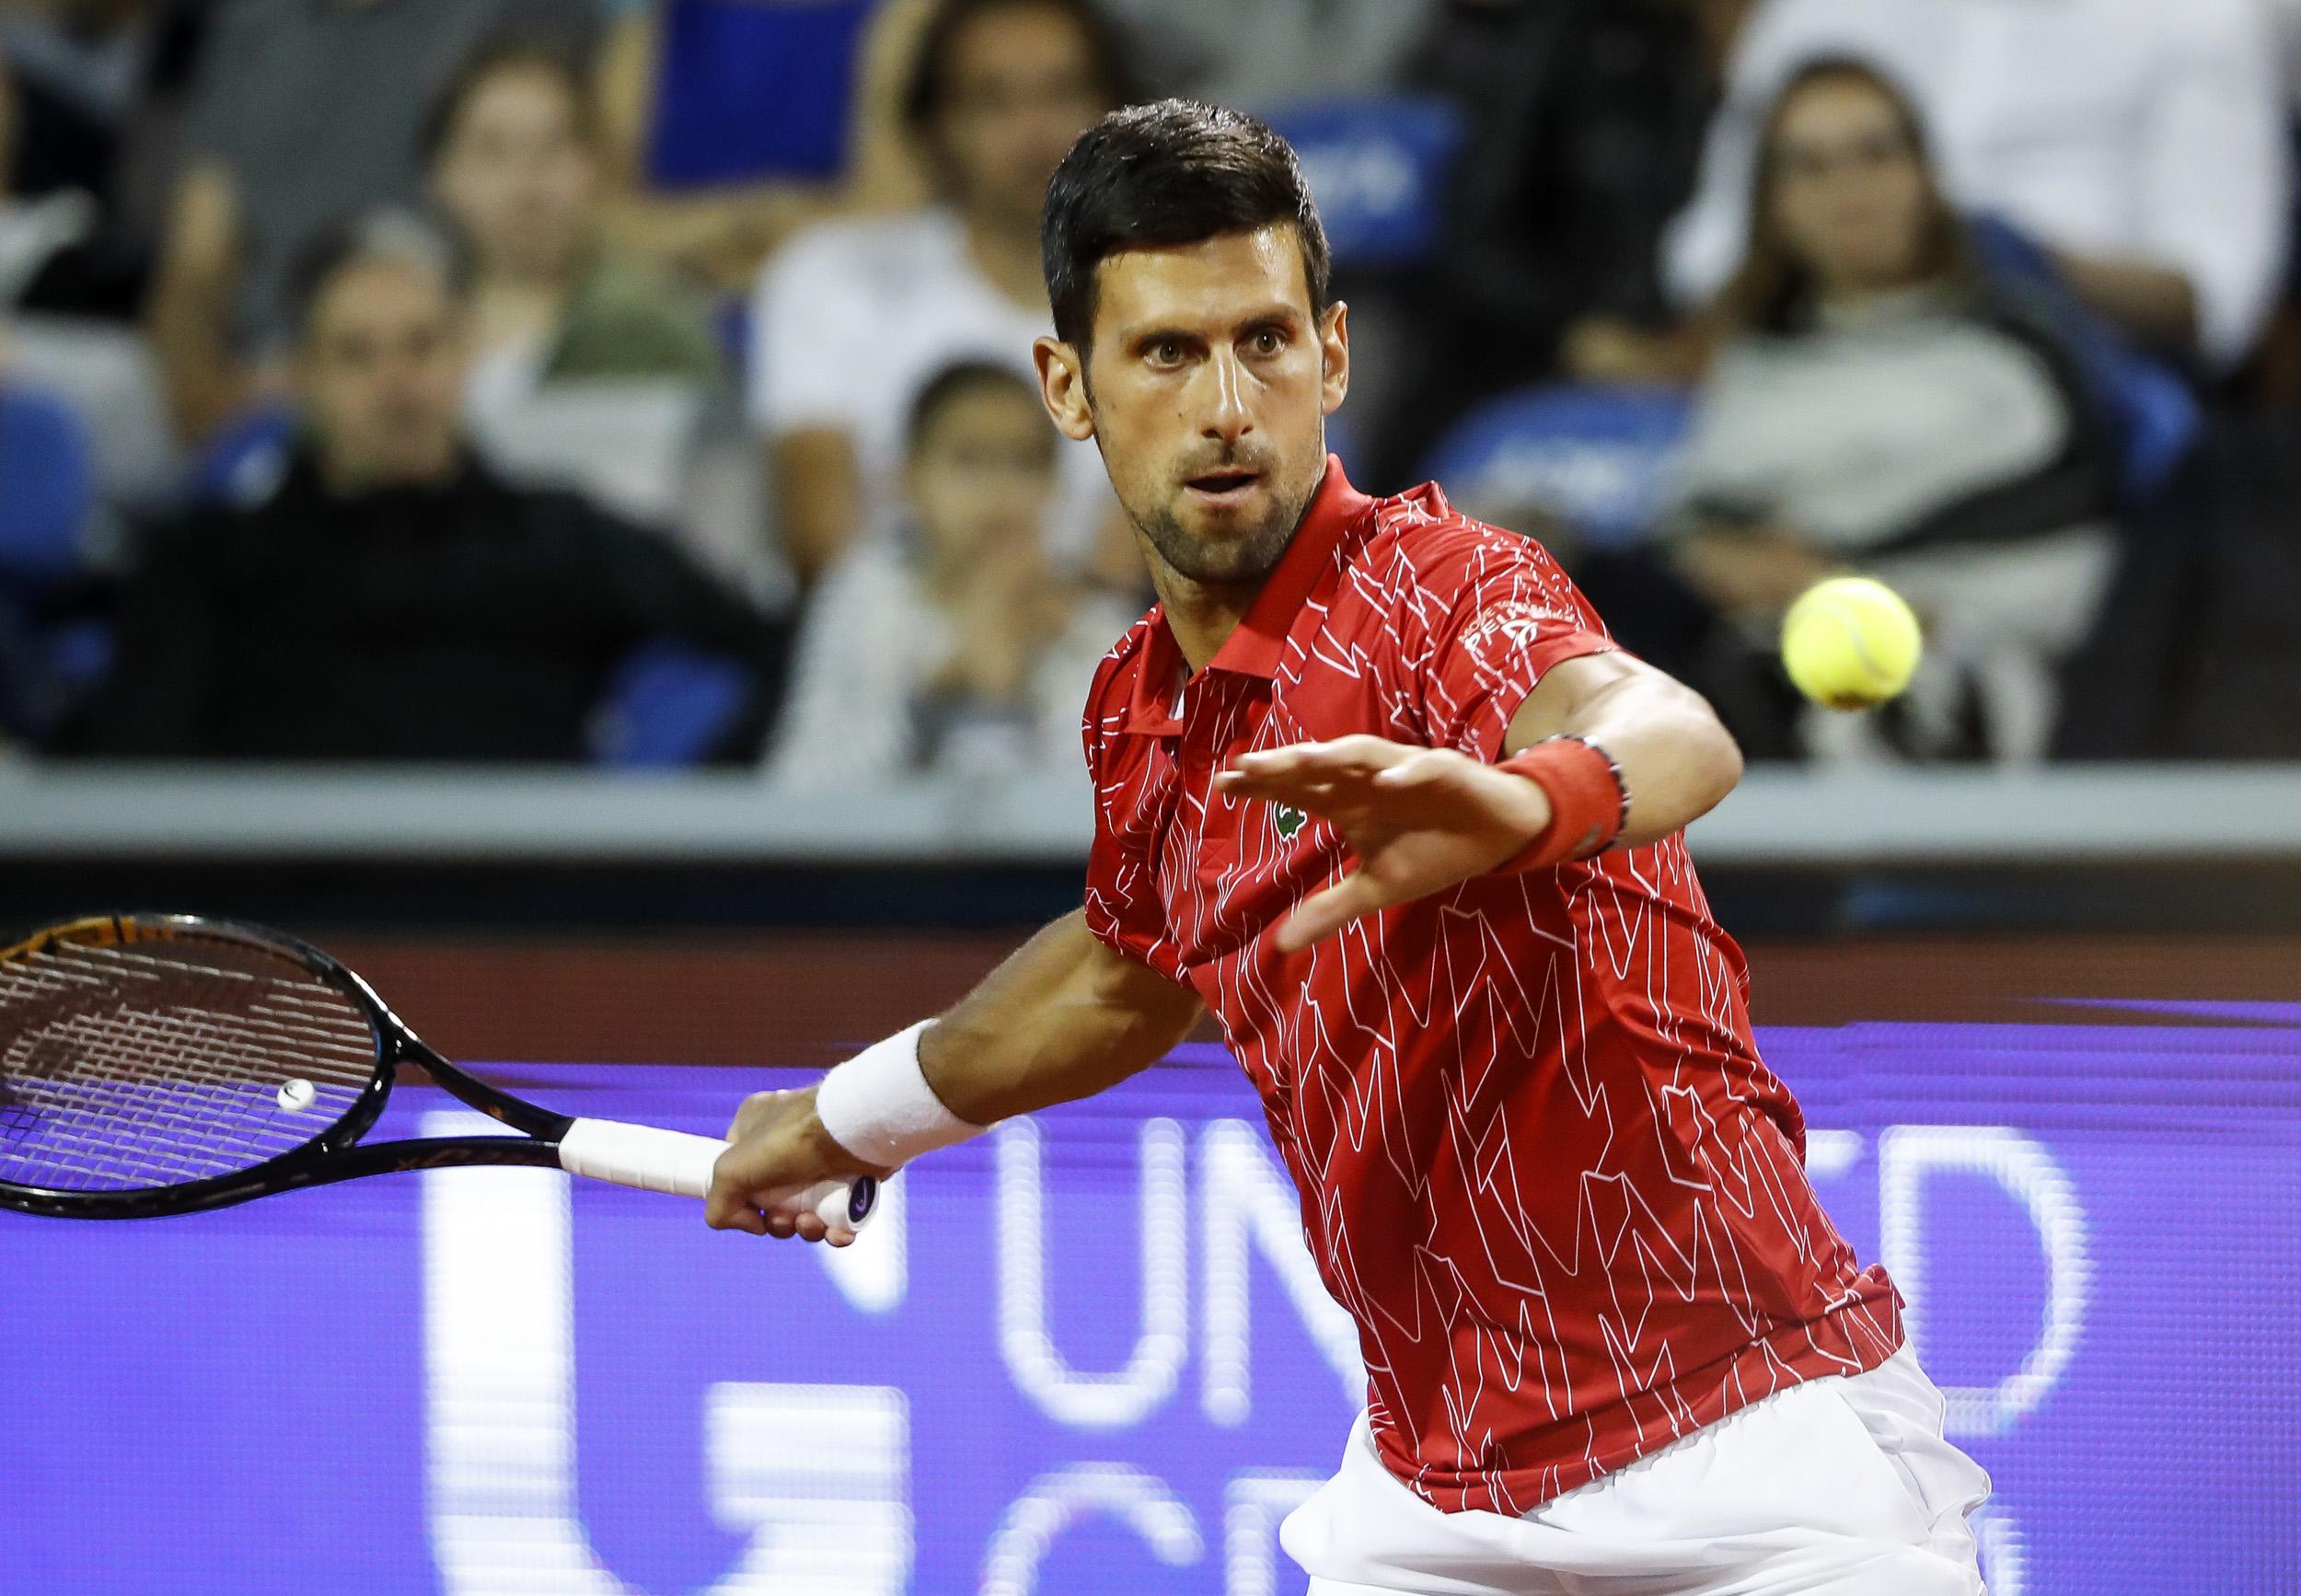 Covid-19: Novak Djokovic tests positive - Citi Sports Online